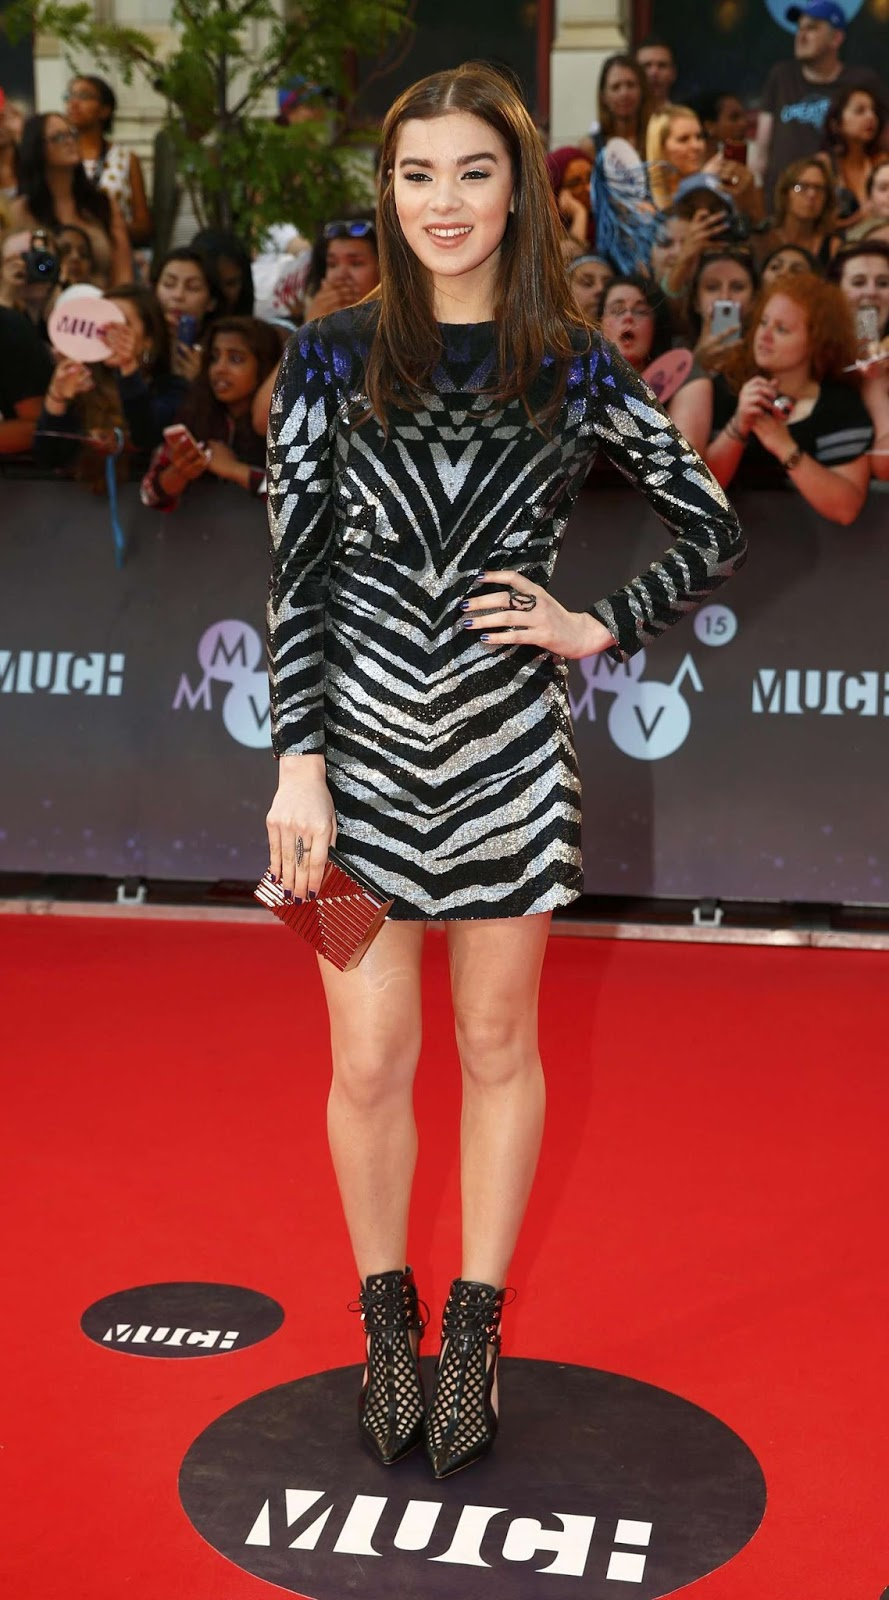 Hailee Steinfeld attends the 2015 MuchMusic Video Awards in Toronto, Canada in an Emilio Pucci zebra print sequin mini dress